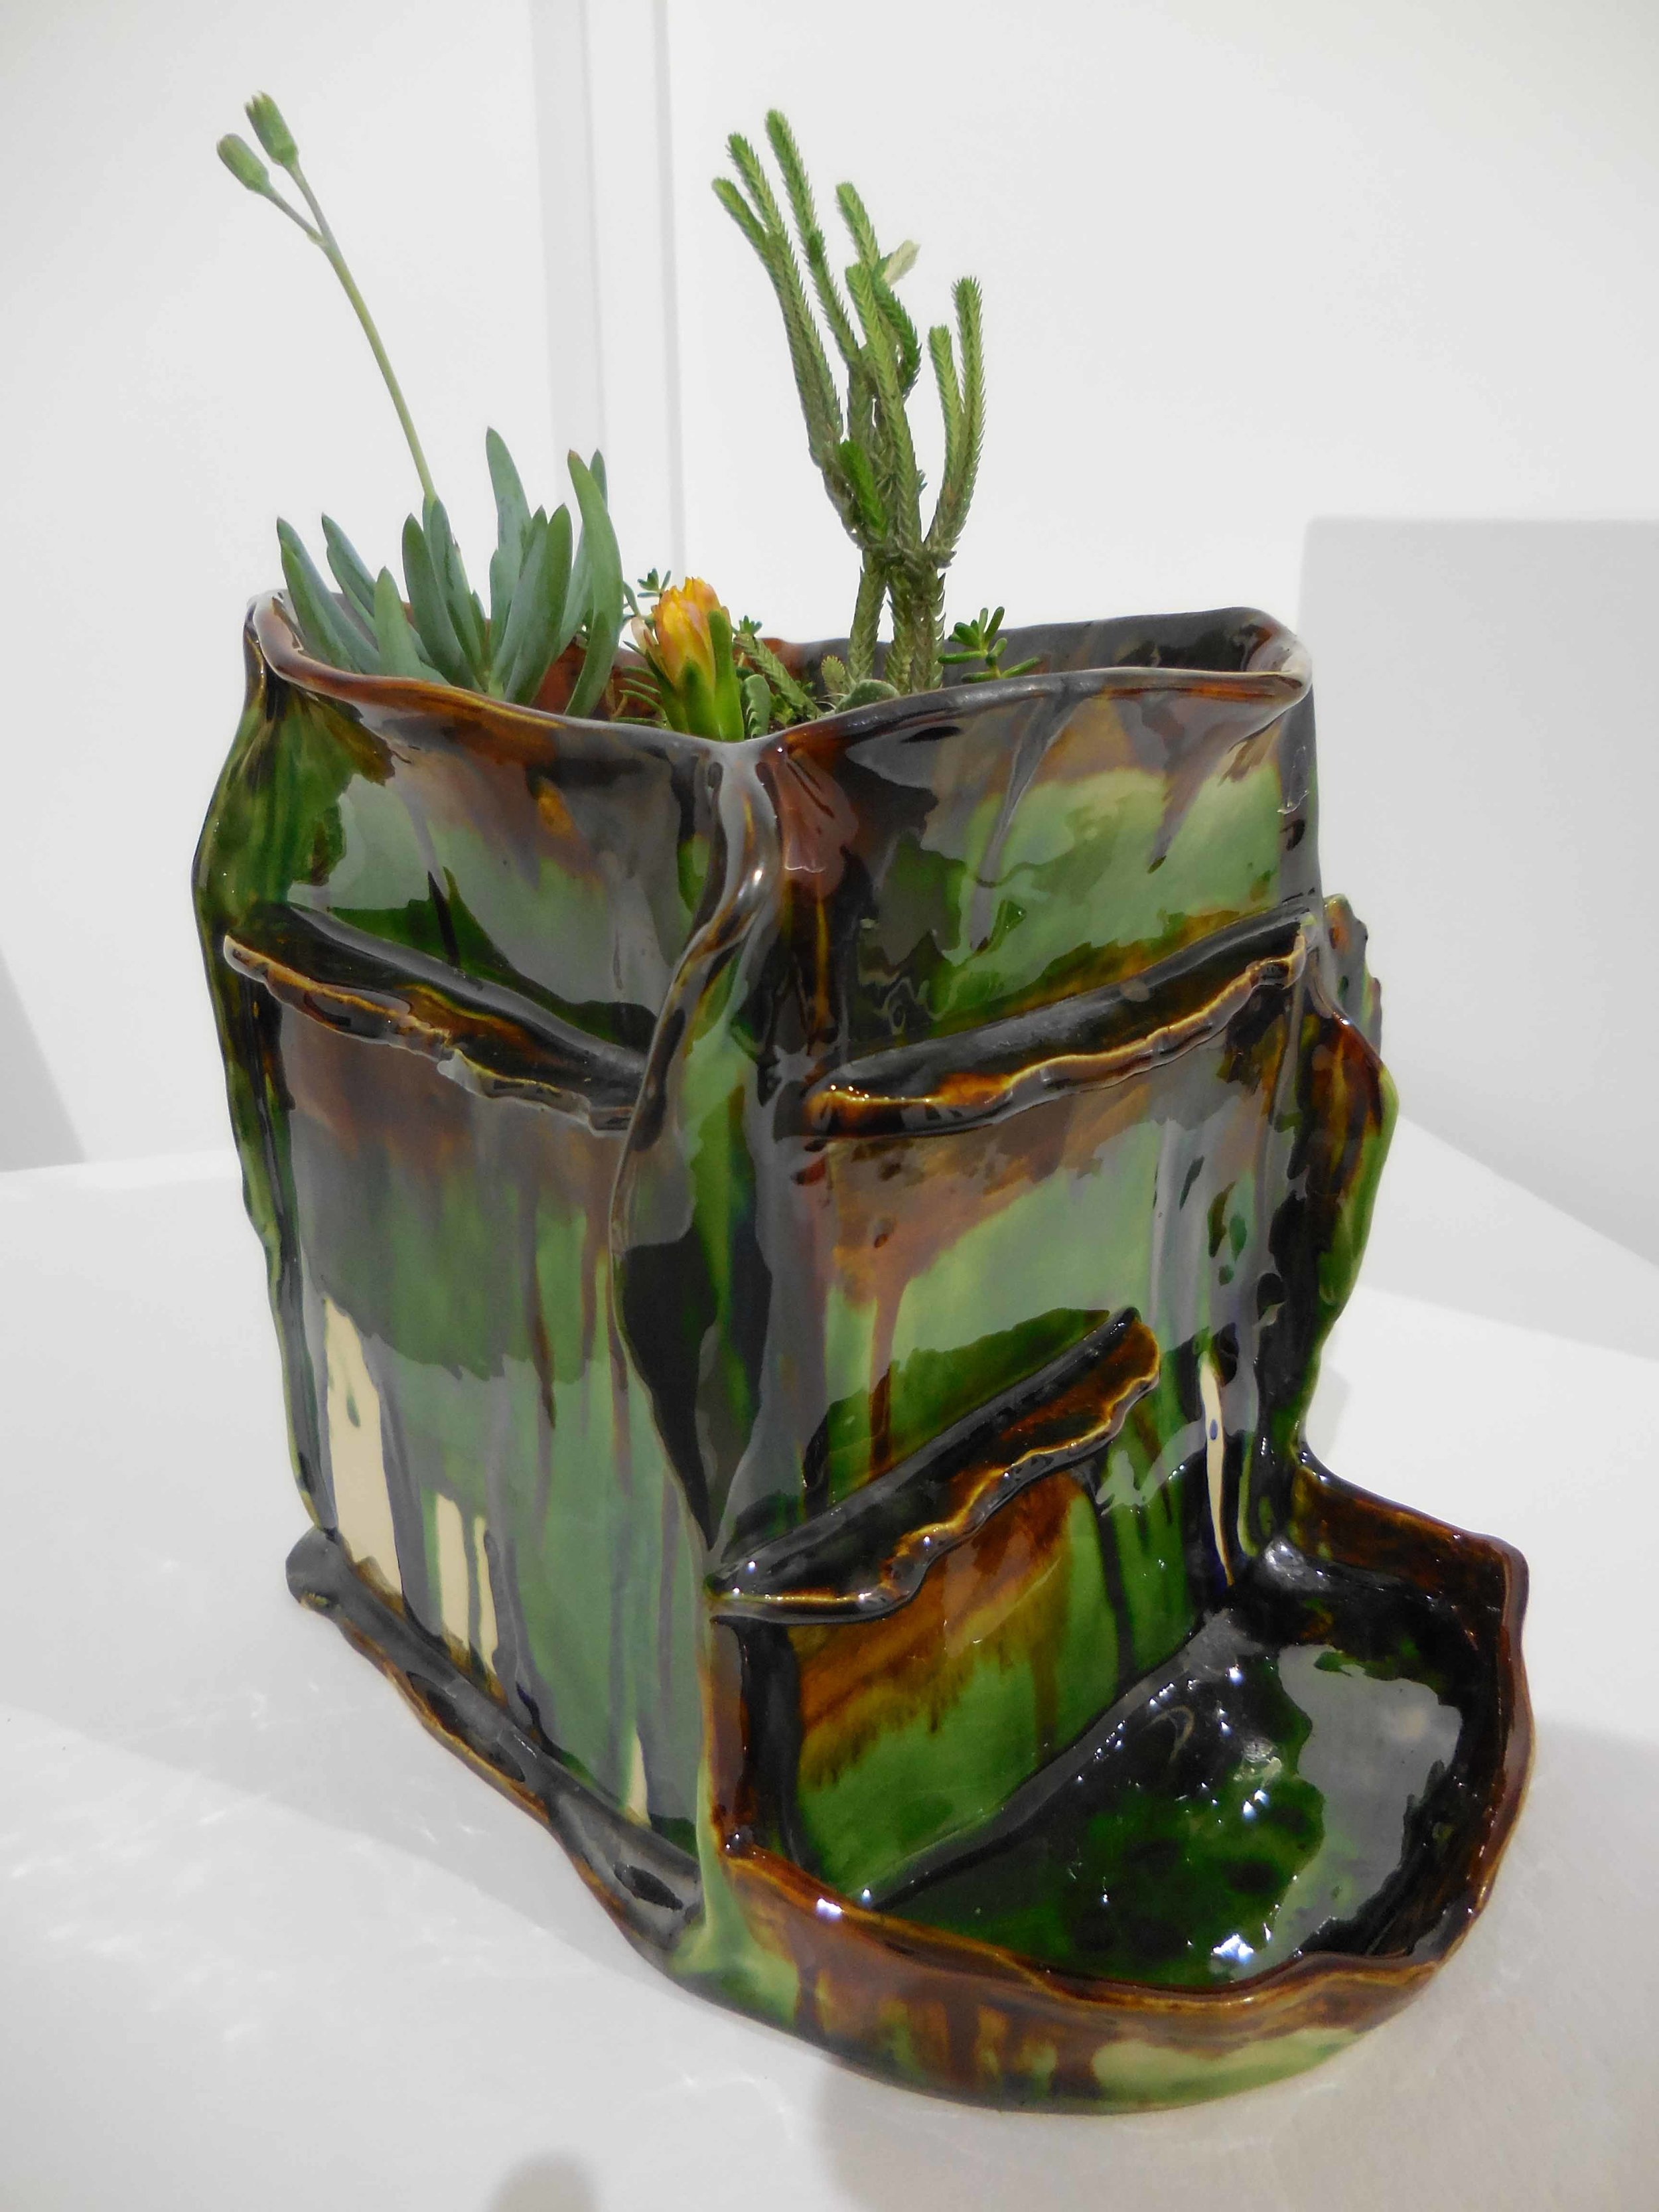 Succulent planter with pond, 2017.  Earthenware, glazed ceramic. 19 x 17 x 19 cm $750